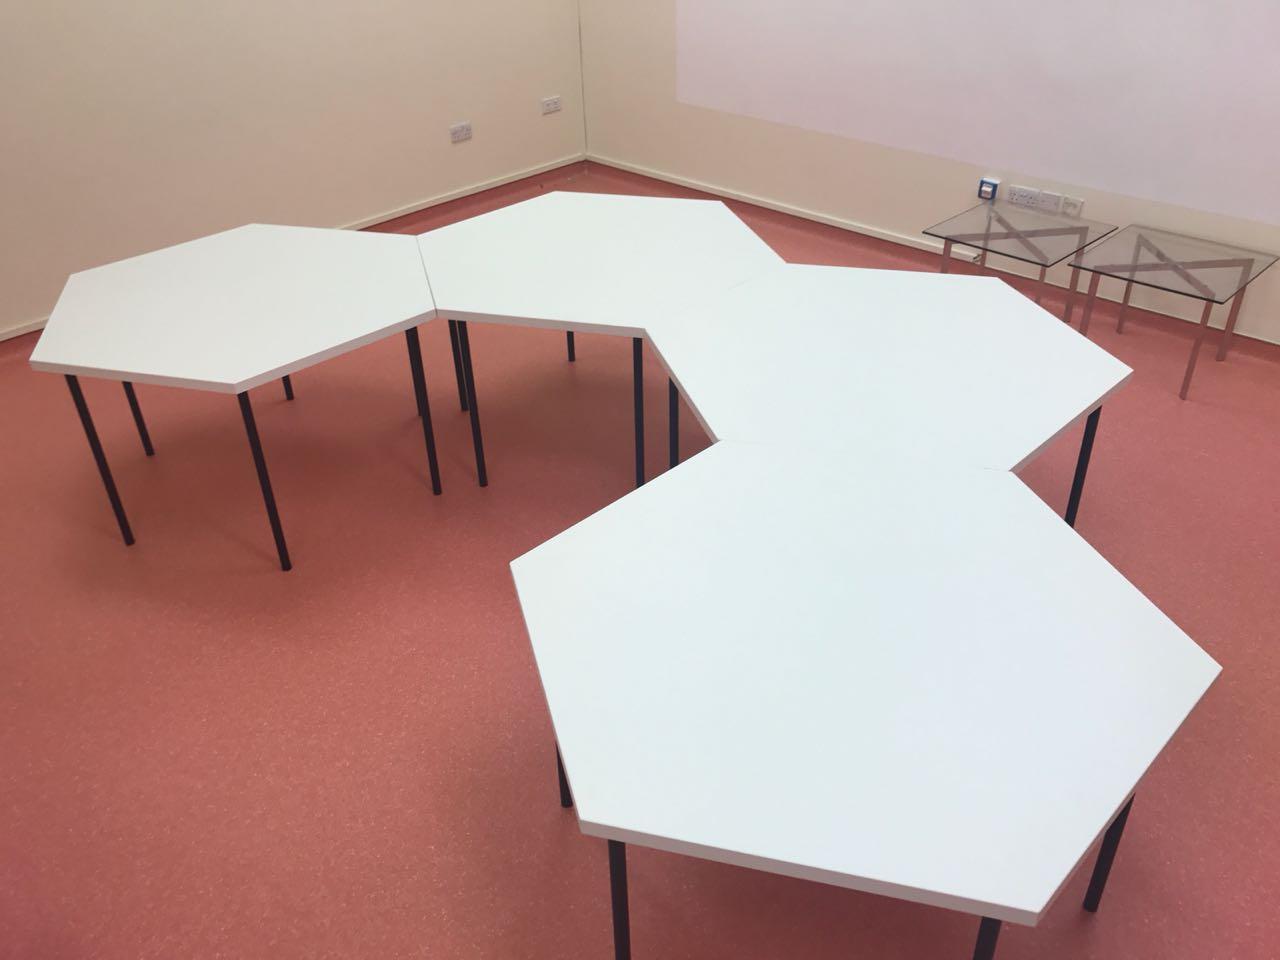 HEXAGONAL TABLES